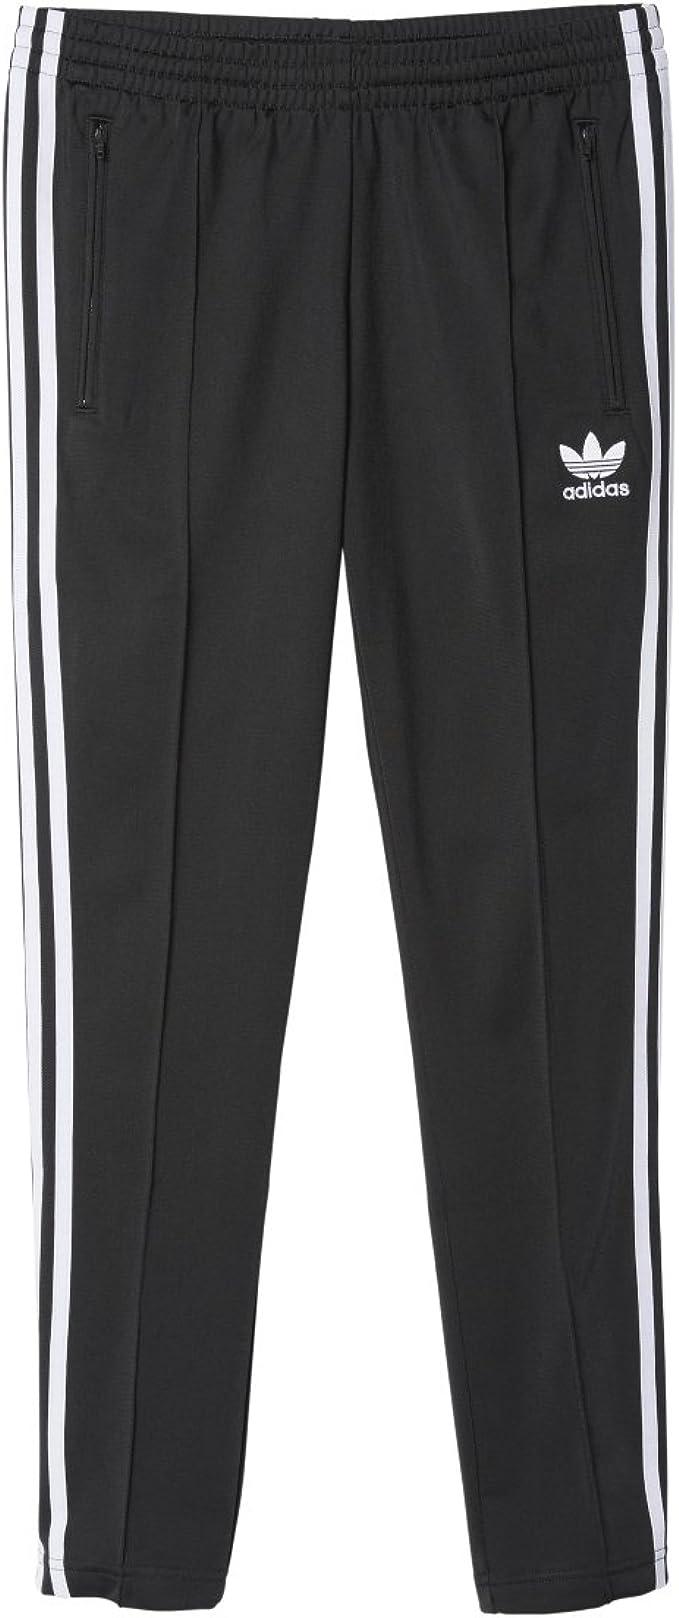 adidas Originals Originals Superstar Track Pantalón de Mujer ...